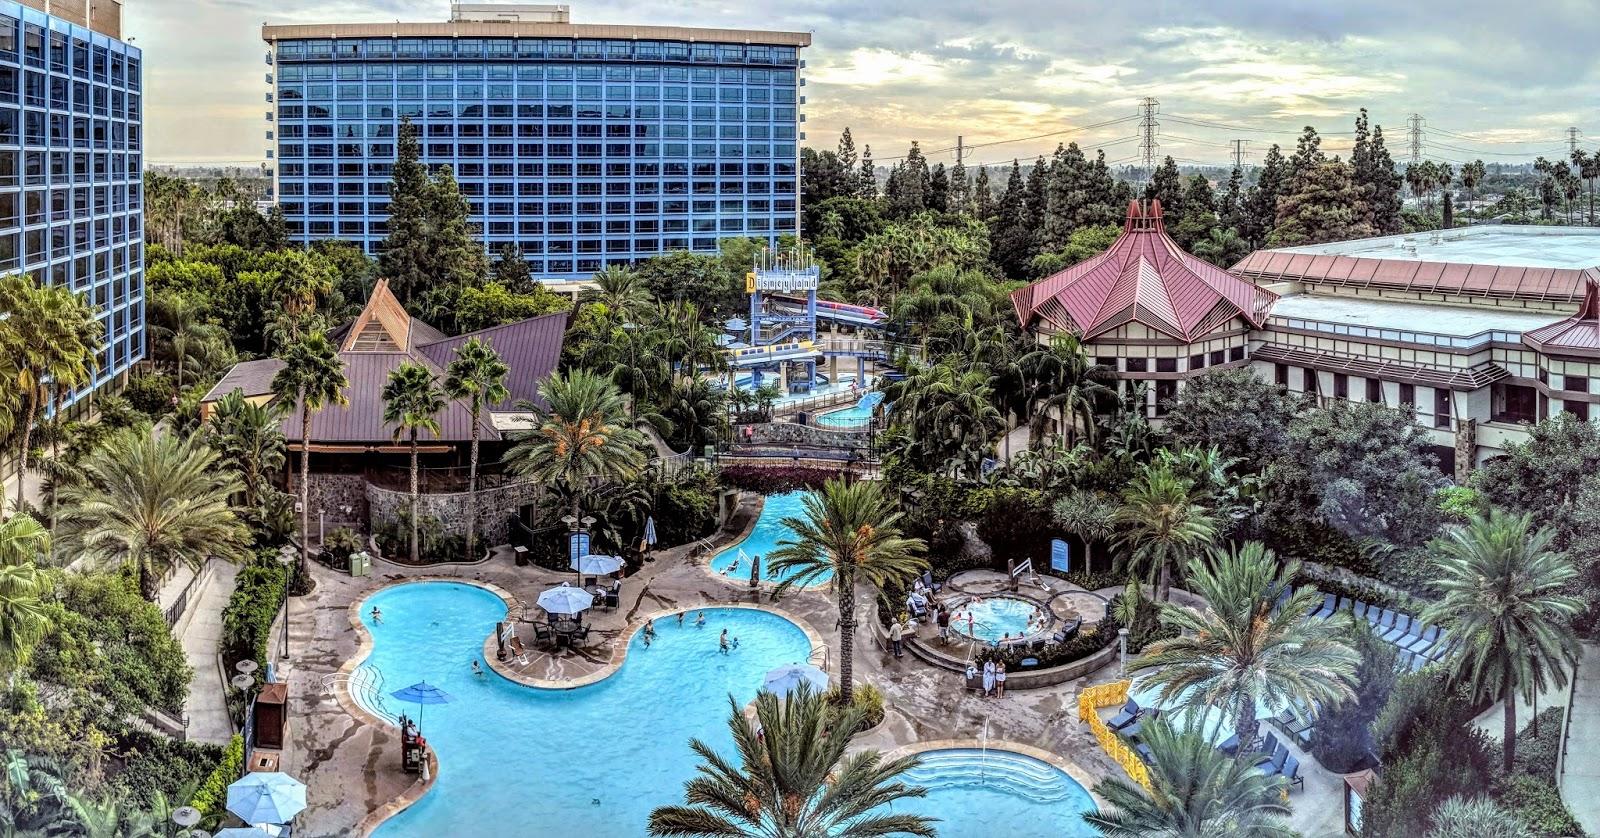 Anaheim Hotels With Kitchen Near Disneyland Outdoor Patio Review Hotel